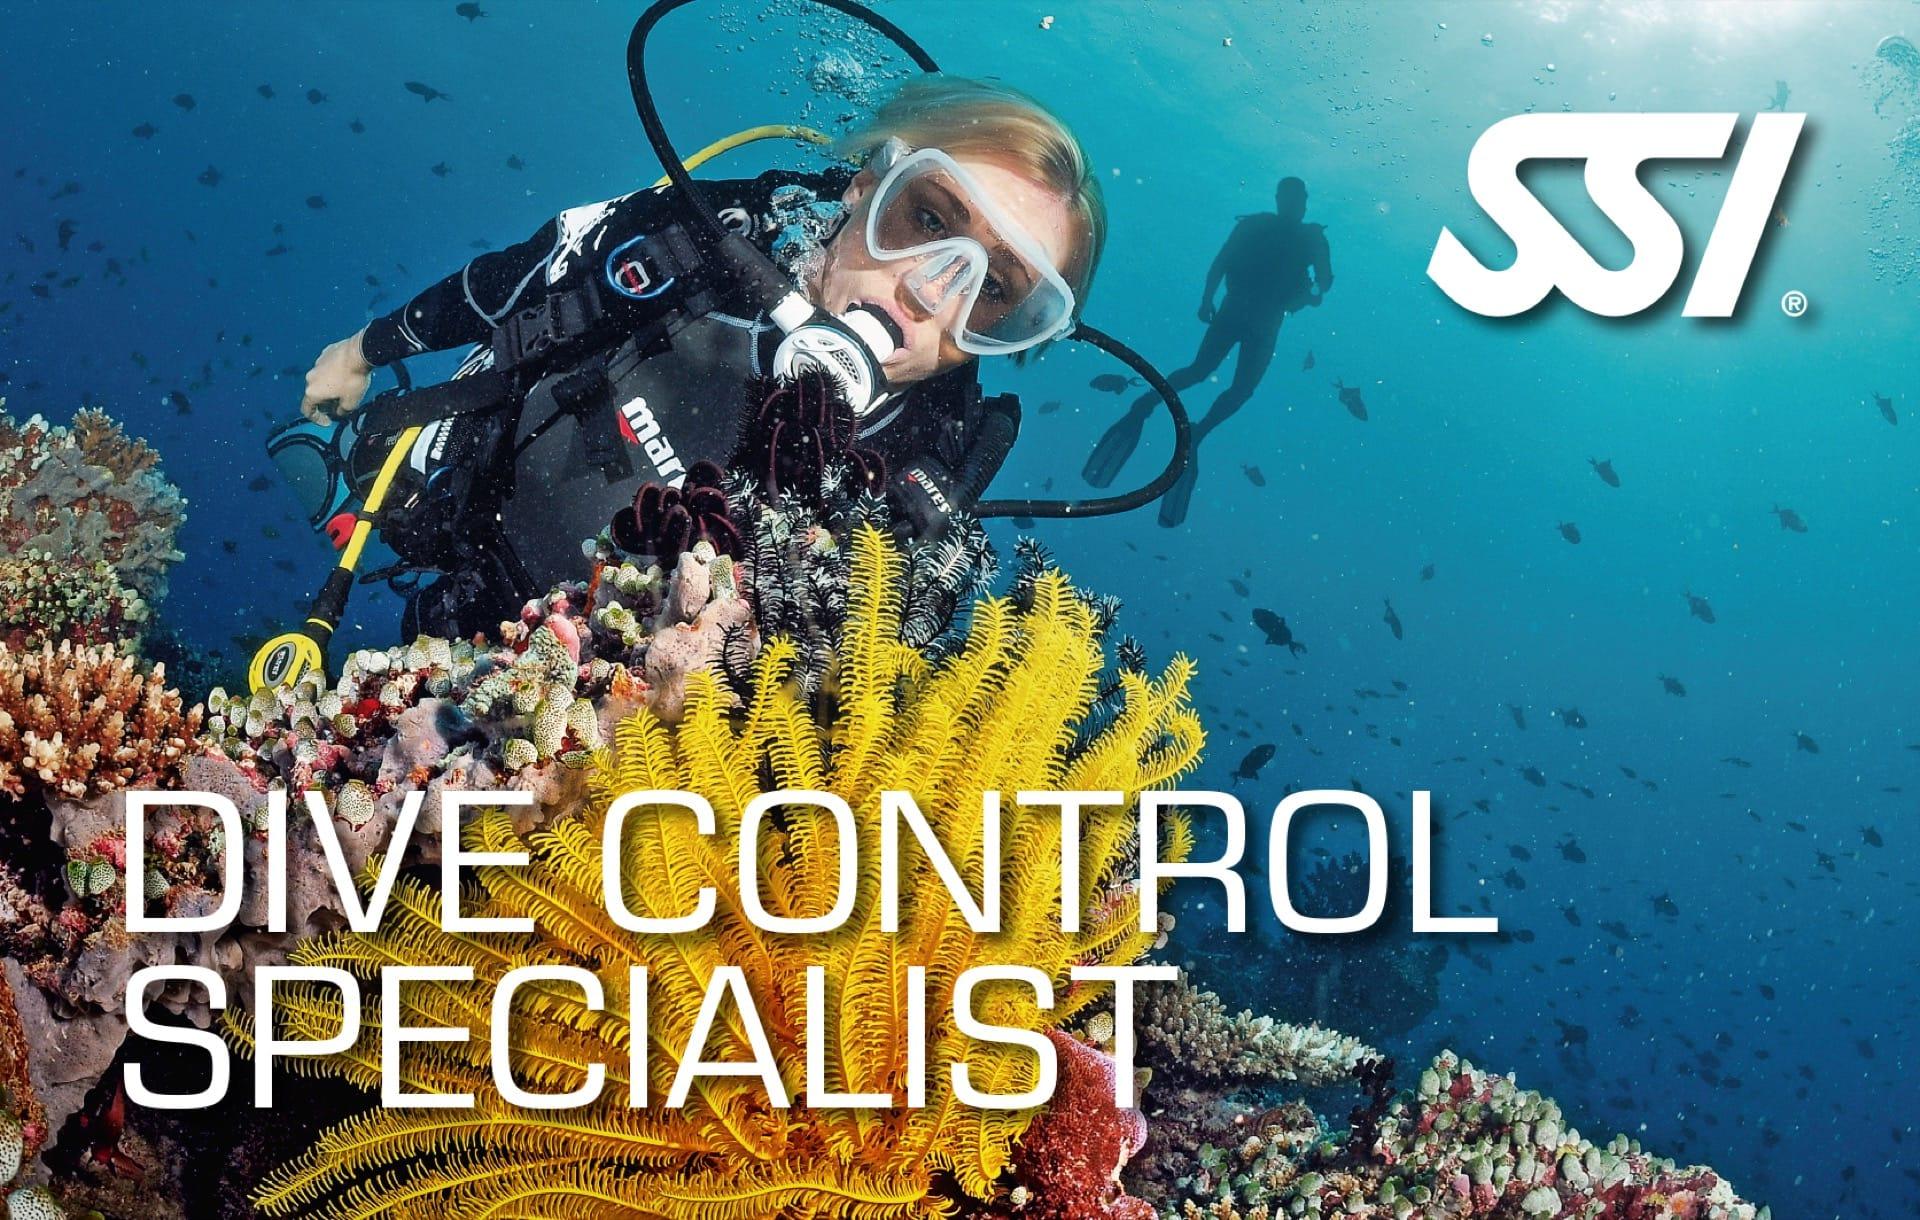 SSI Dive Control Specialist Course | SSI Dive Control Specialist | Dive Control Specialist | Diving Course | Eko Divers